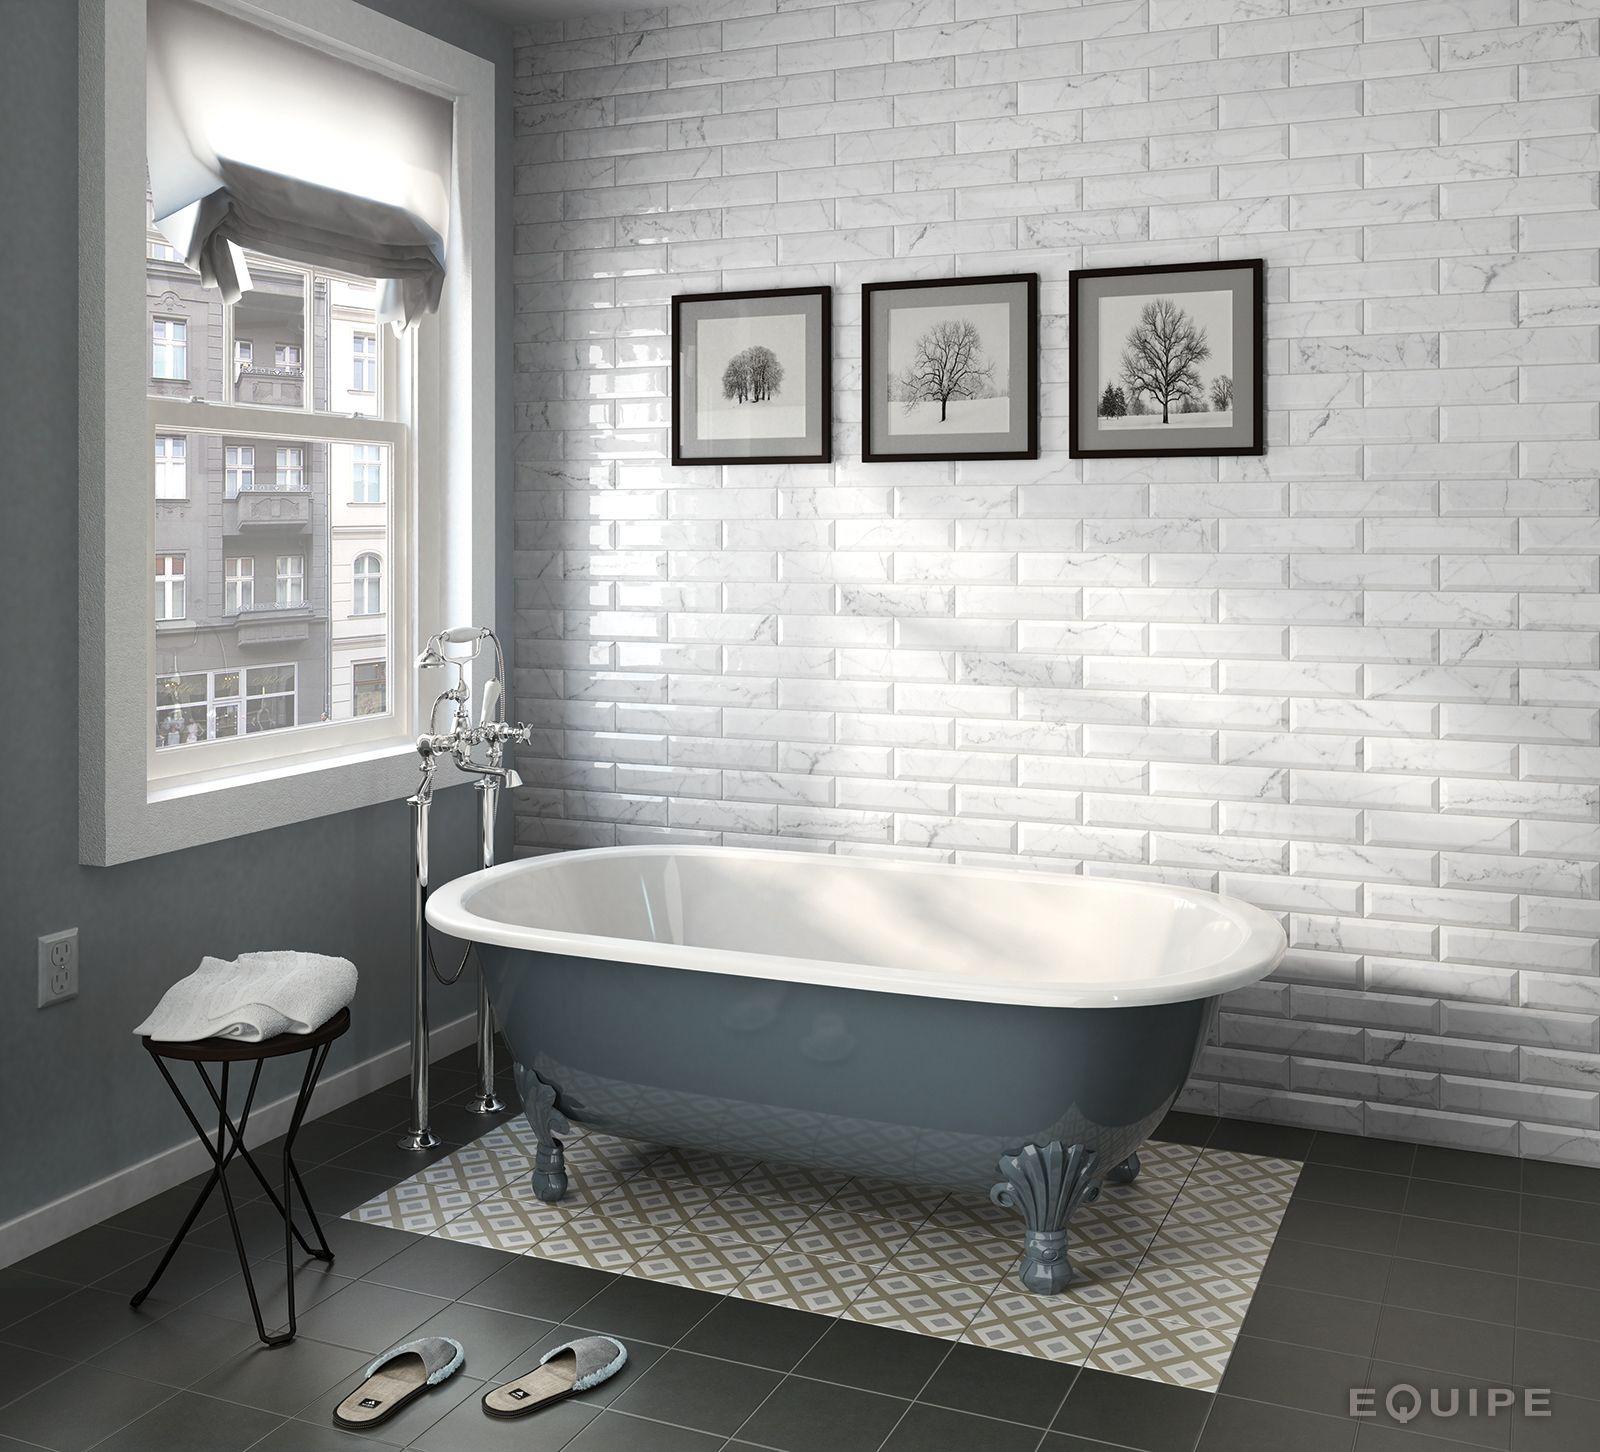 Pin by lyh yra on sweet pinterest black decor carrara carrara series marble effect bevel edge gloss ceramic wall tiles dailygadgetfo Images